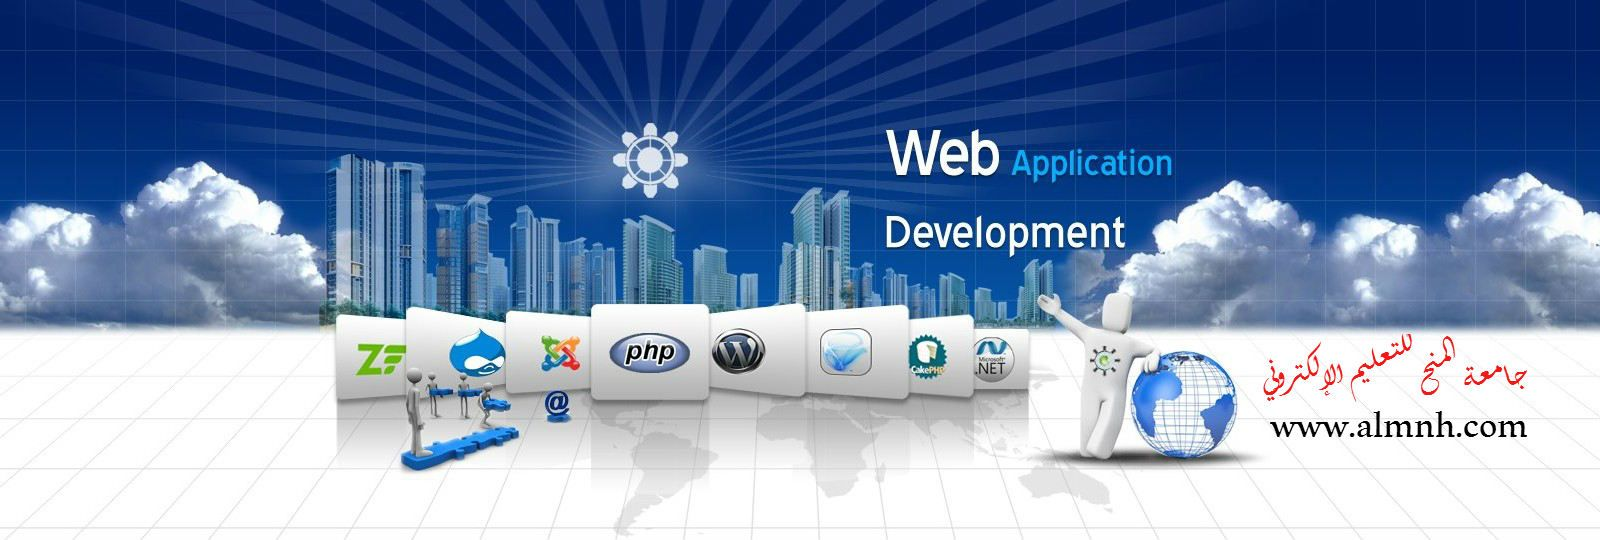 Web Development Course Web Development Design Web Design Company Web Application Development